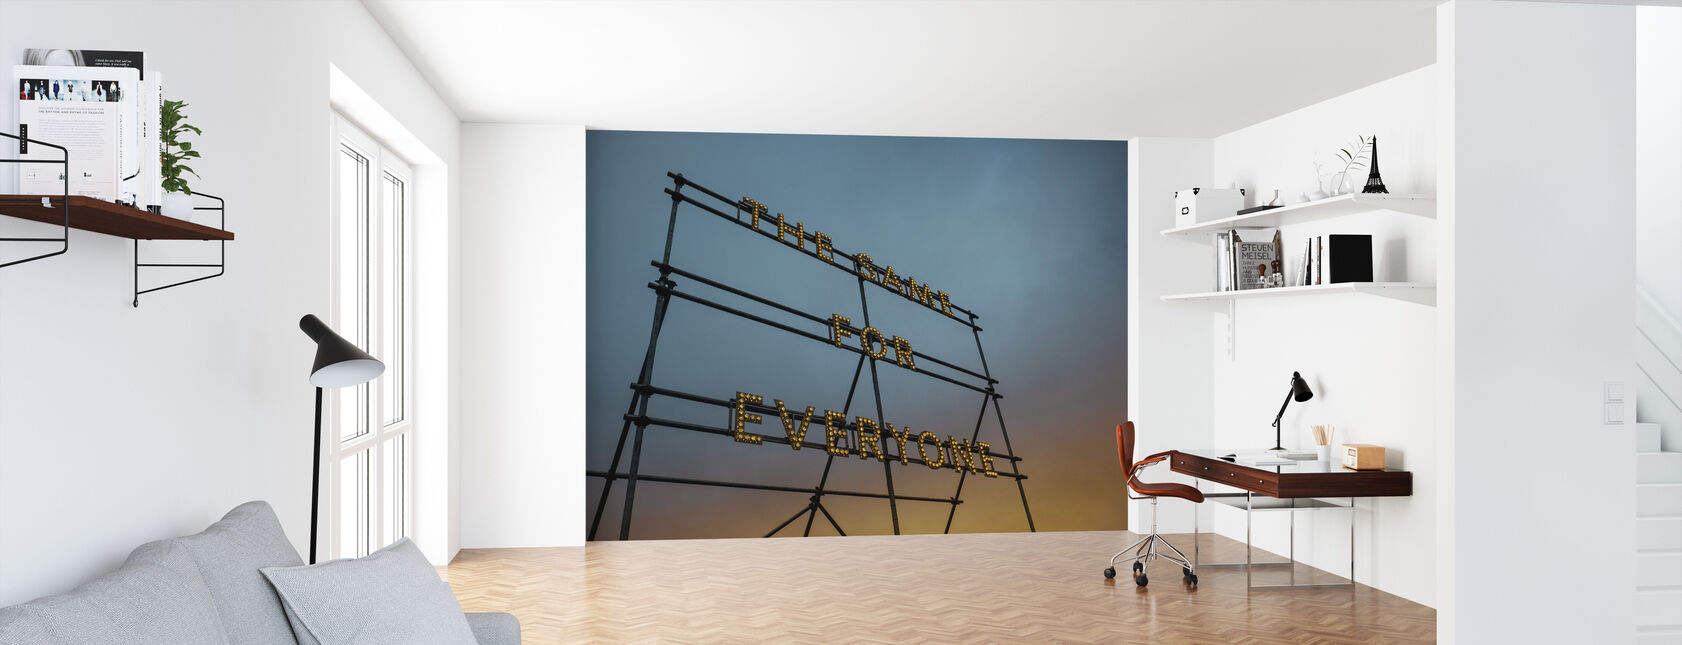 Typography Art Lights - Wallpaper - Office